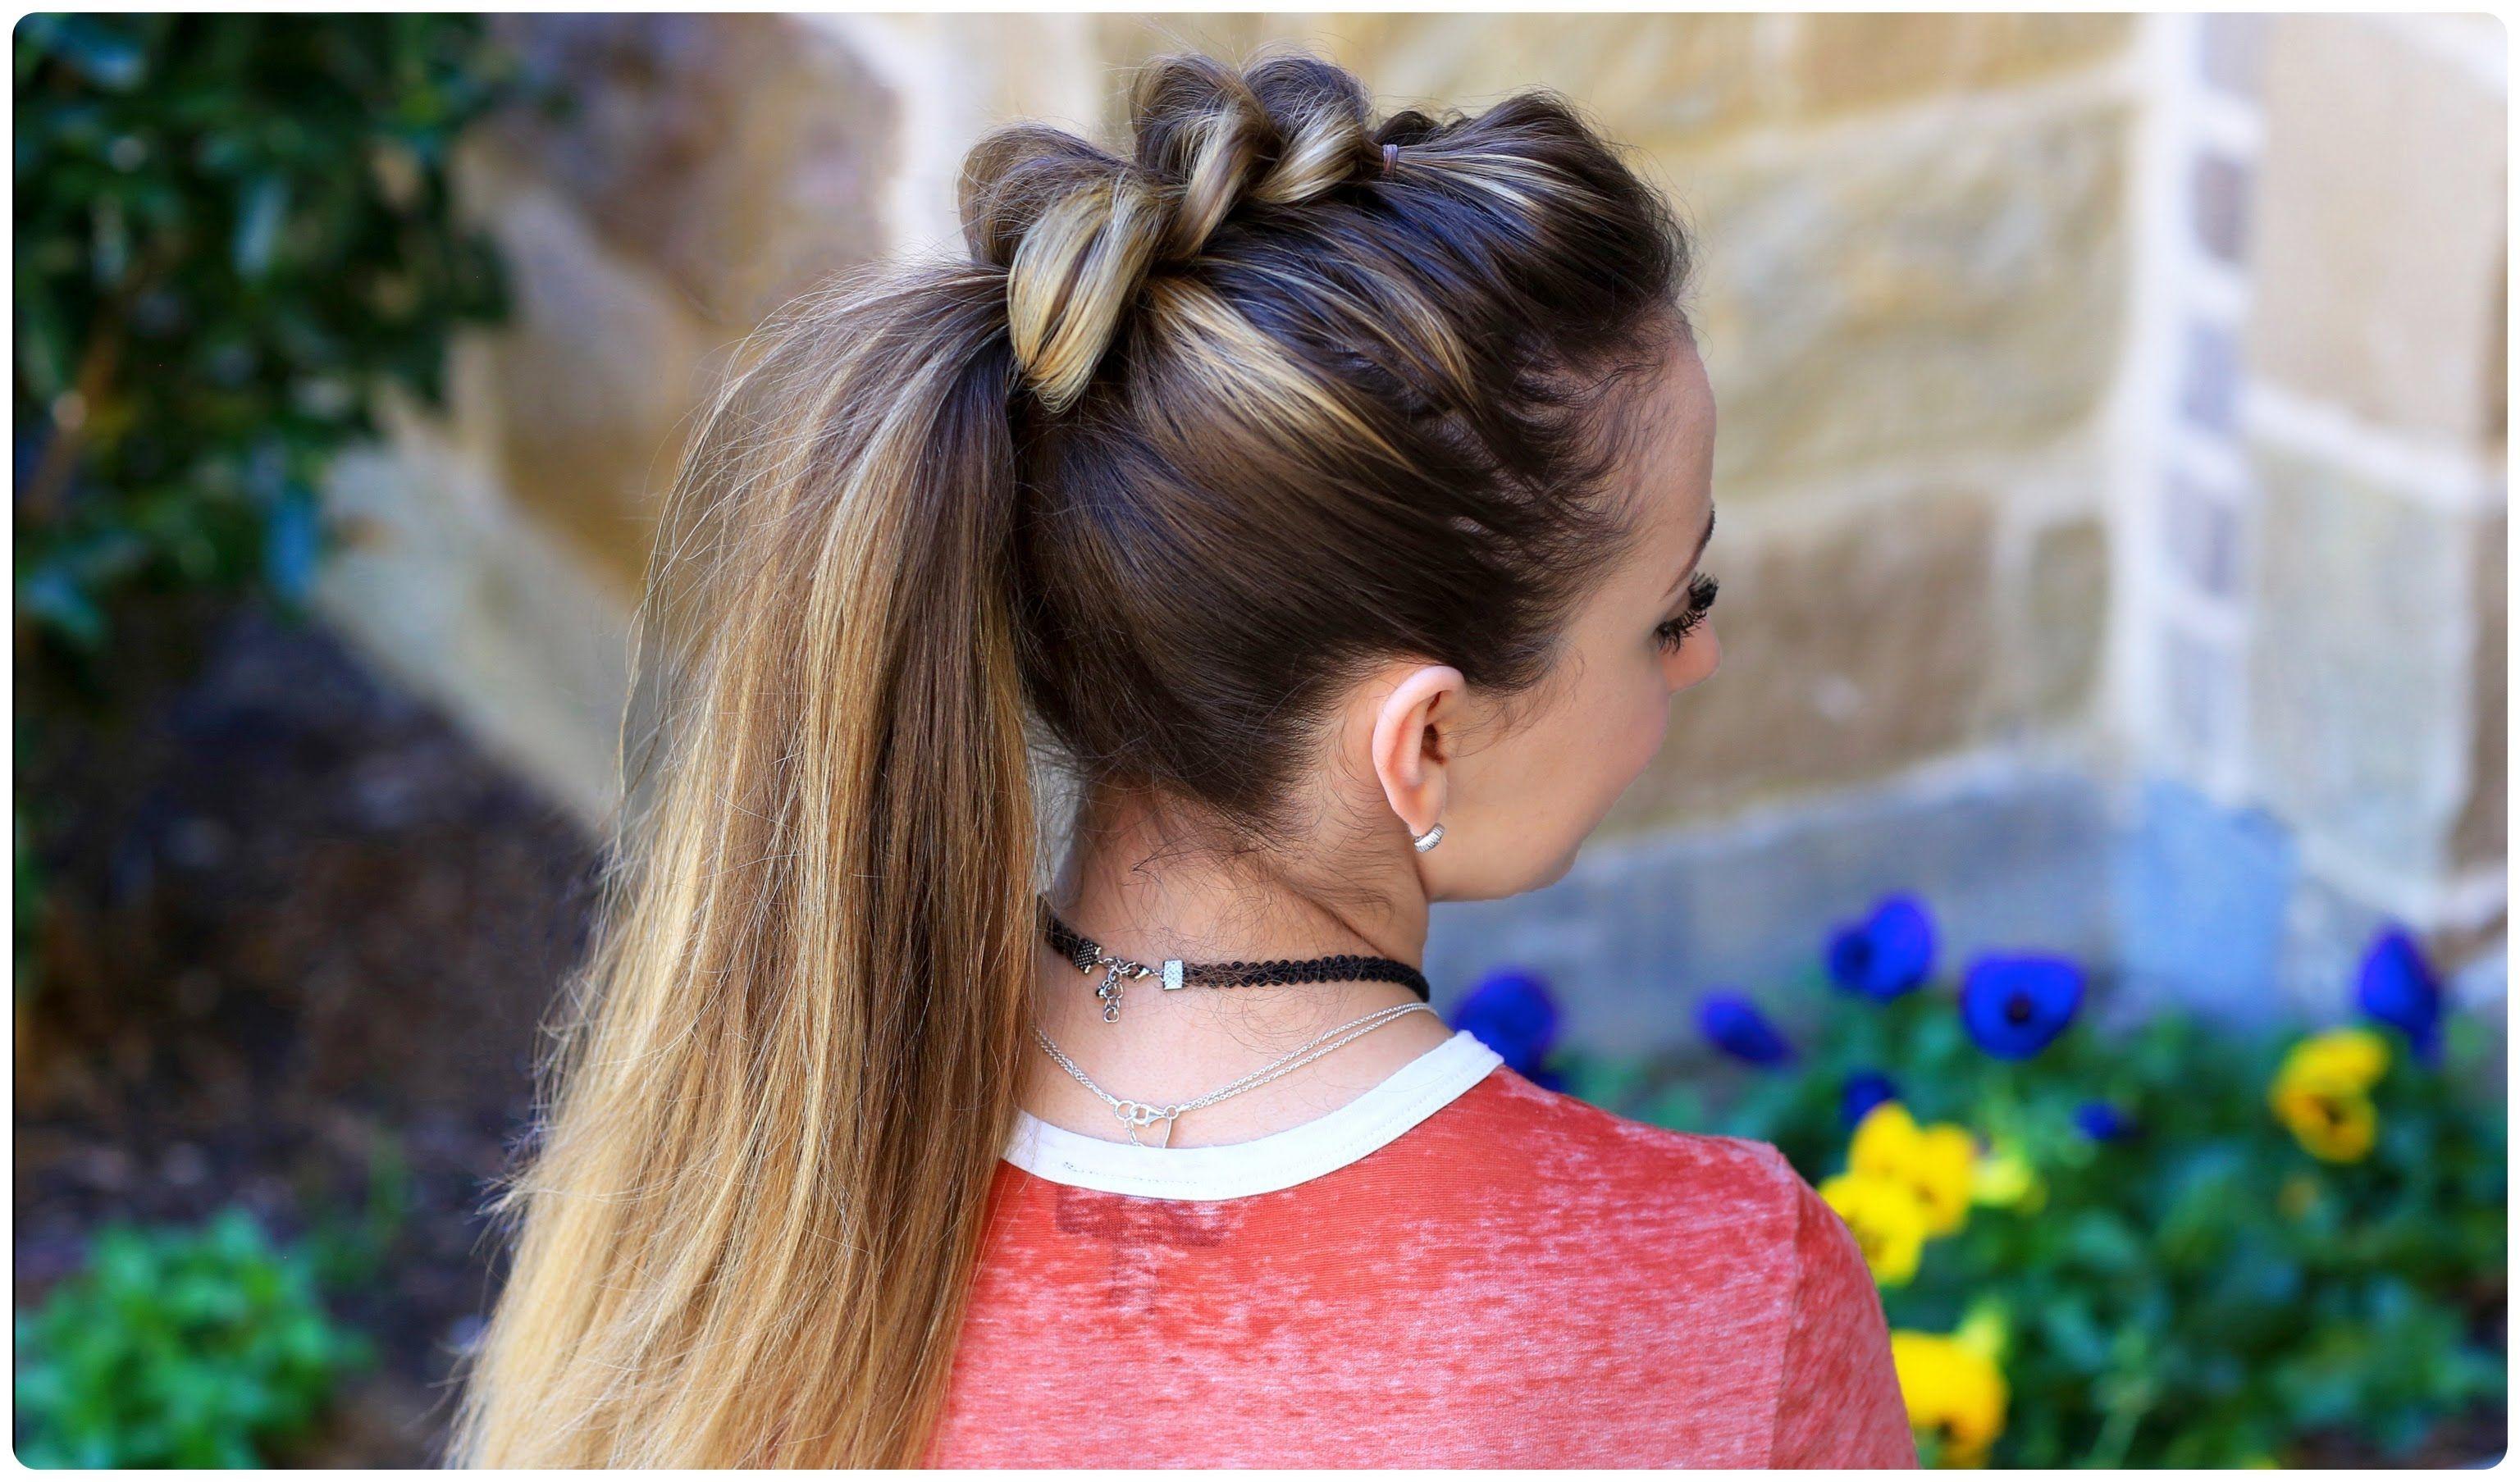 Pull-Thru Ponytail | Cute Girls Hairstyles | Cute Girls Hairstyles ...